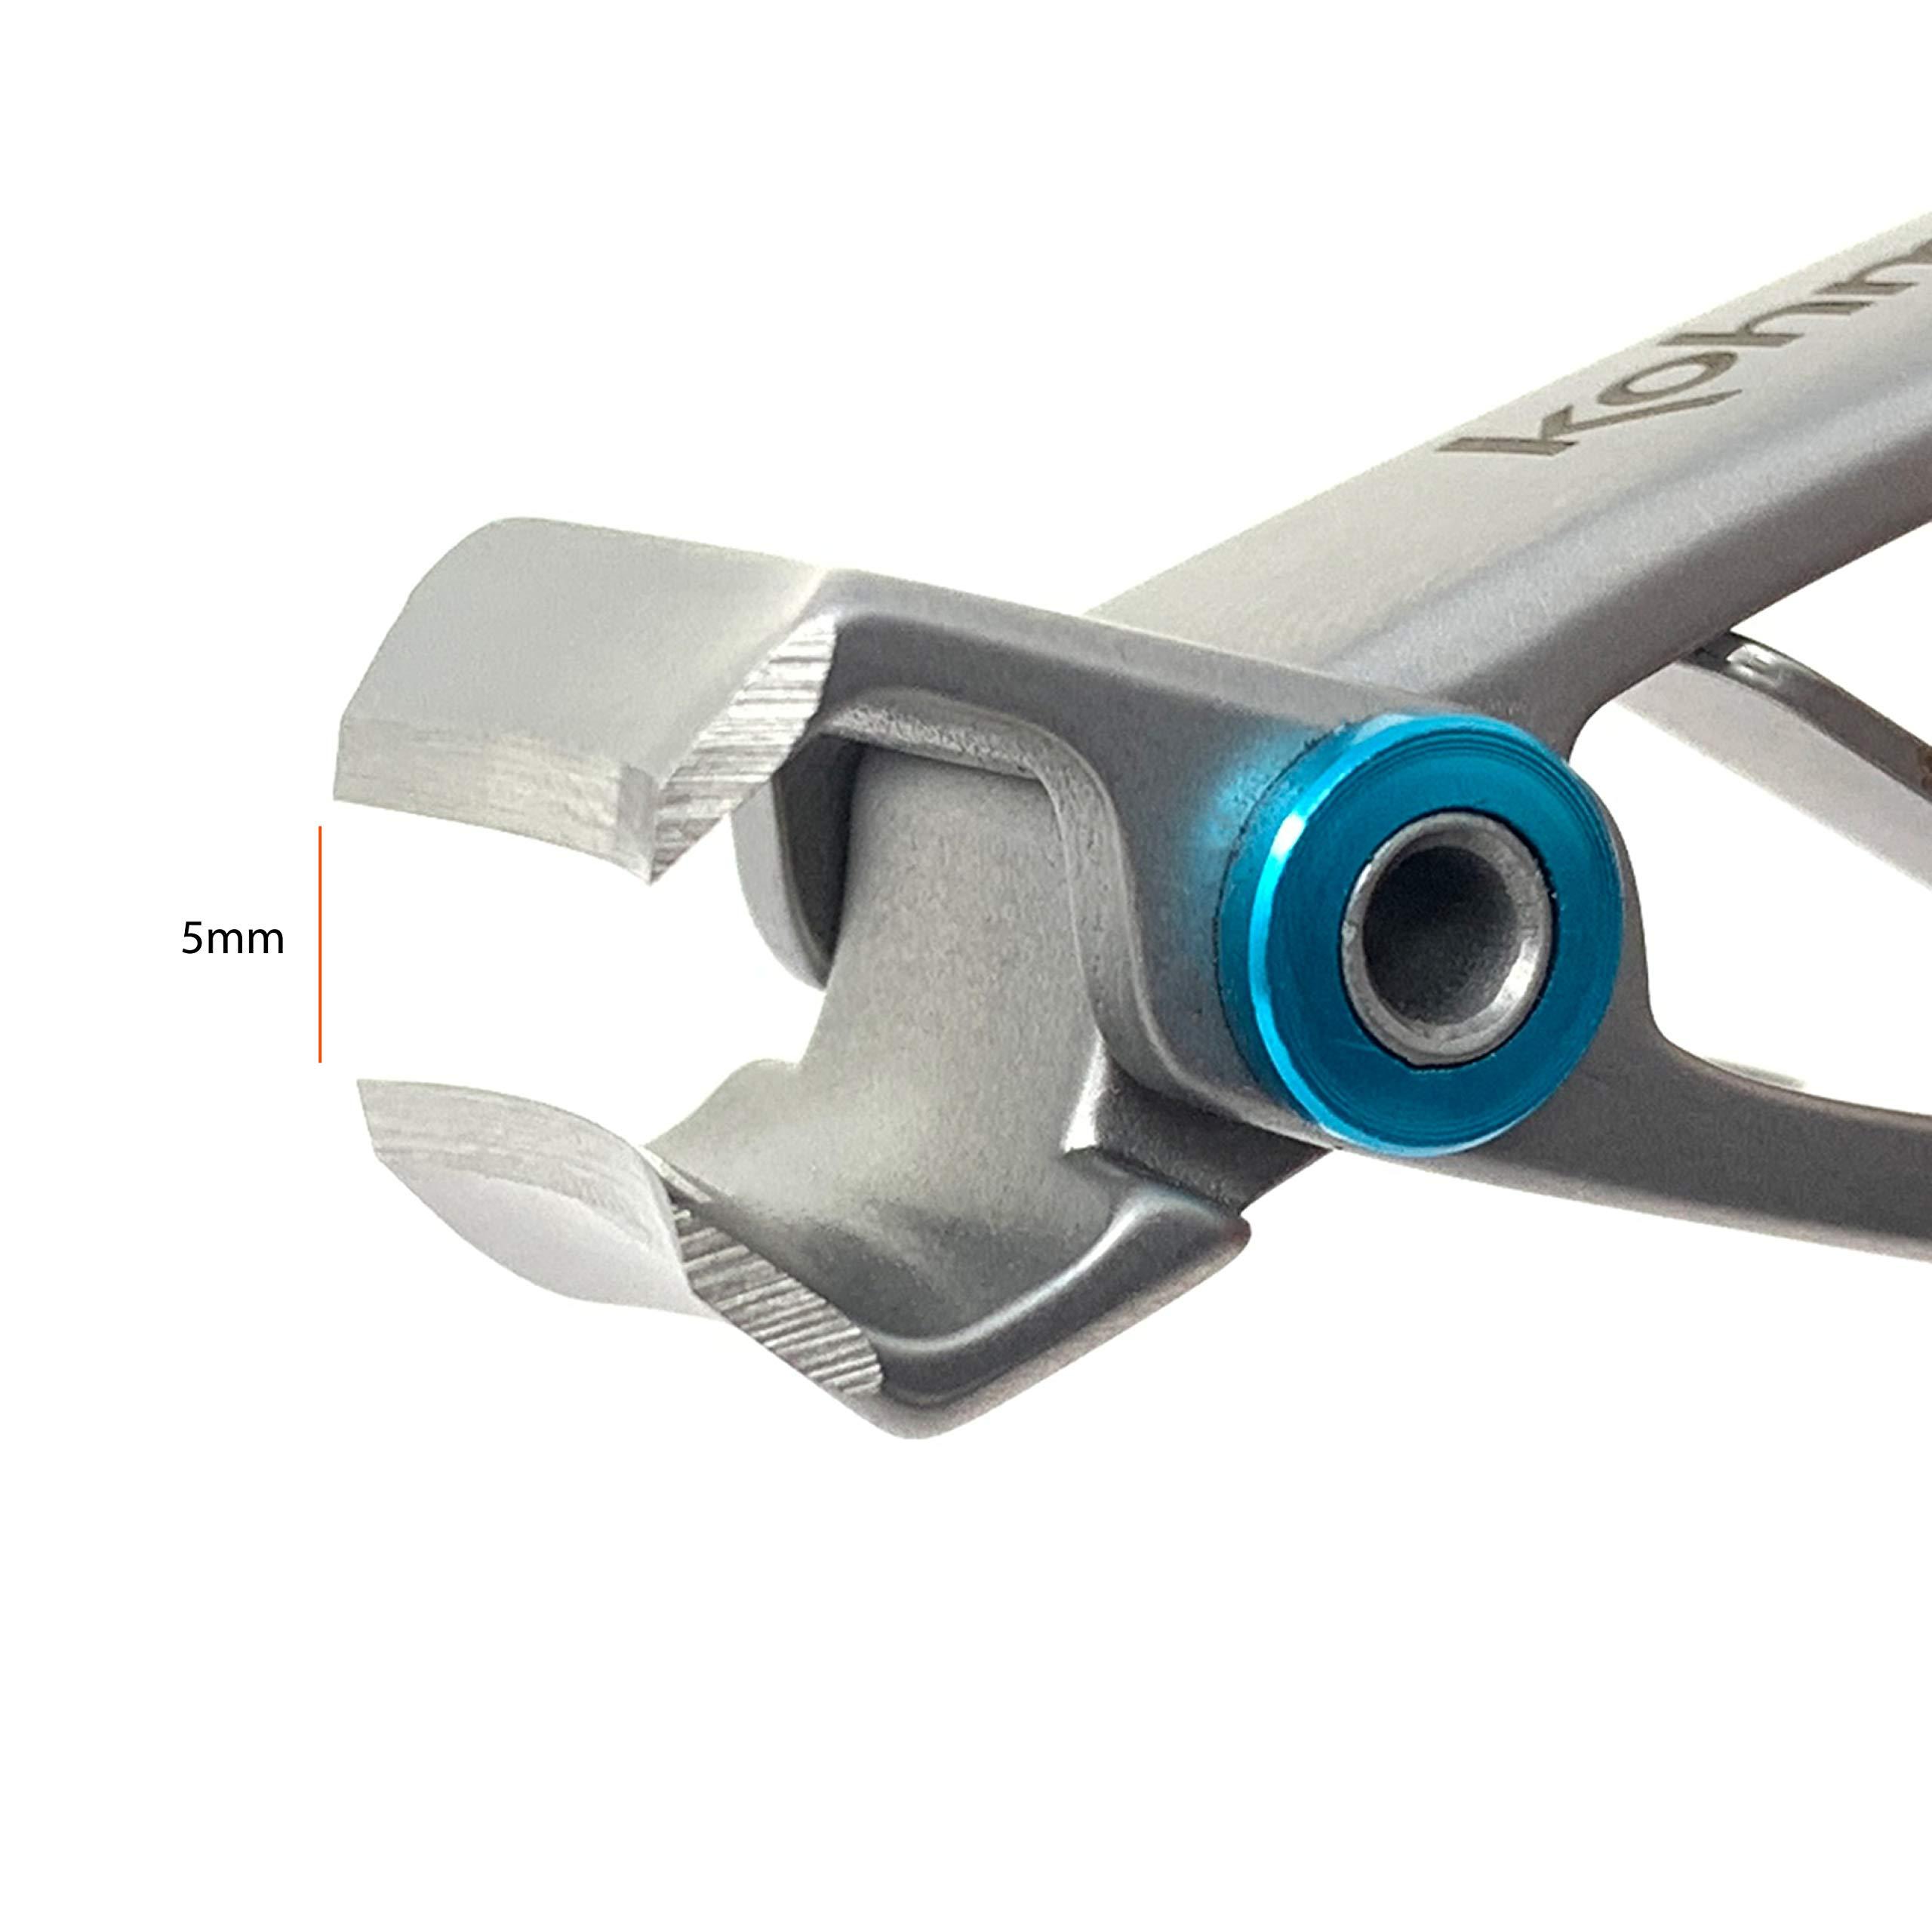 Kohm CP-120L 5mm Heavy Duty, Wide Jaw Toenail Clippers for Thick Toenails or Tough Fingernails, Large Toenail Clippers for Men, Seniors, Adults by KOHM